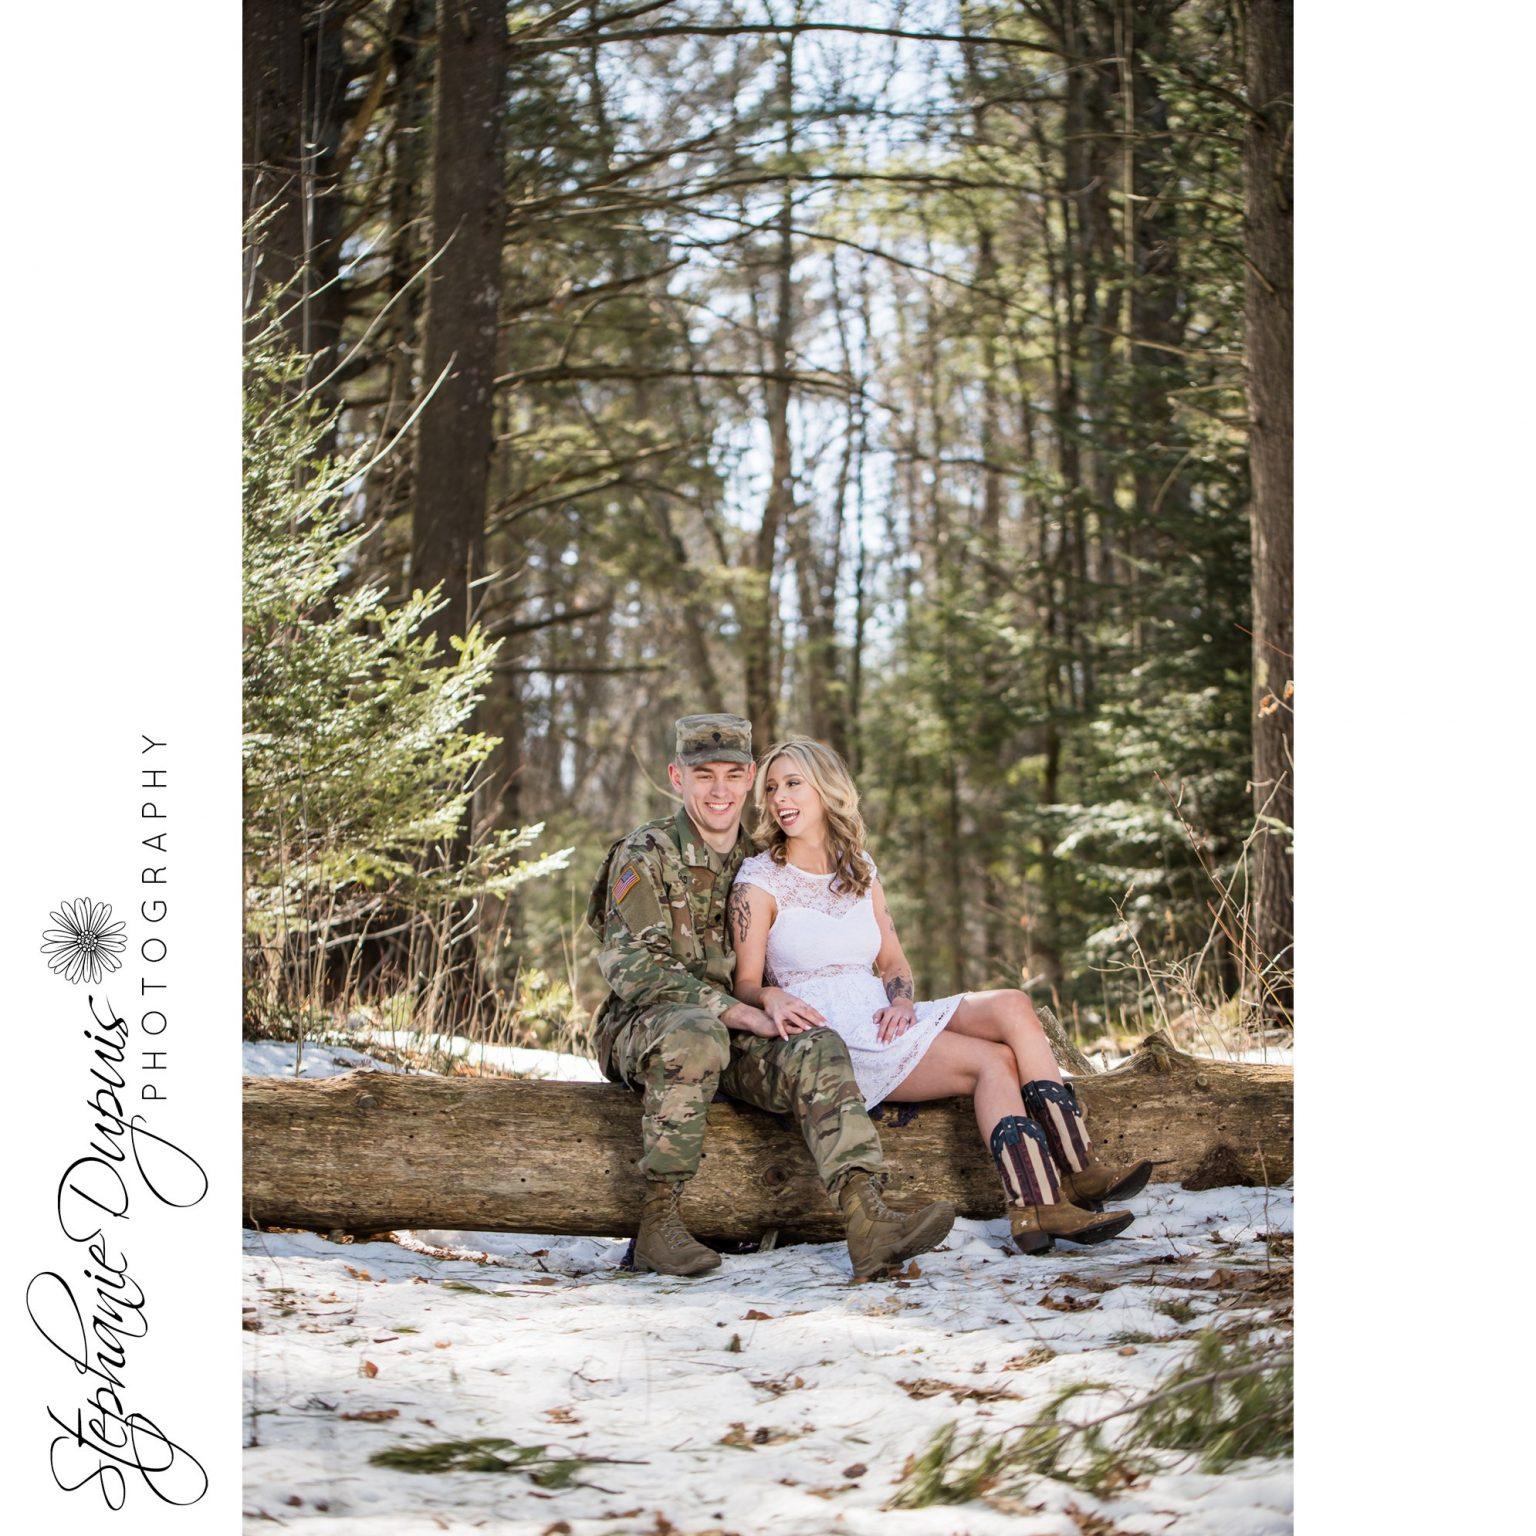 dwyer engagement 13 1536x1536 - Portfolio: Spencer & Kali's Engagement